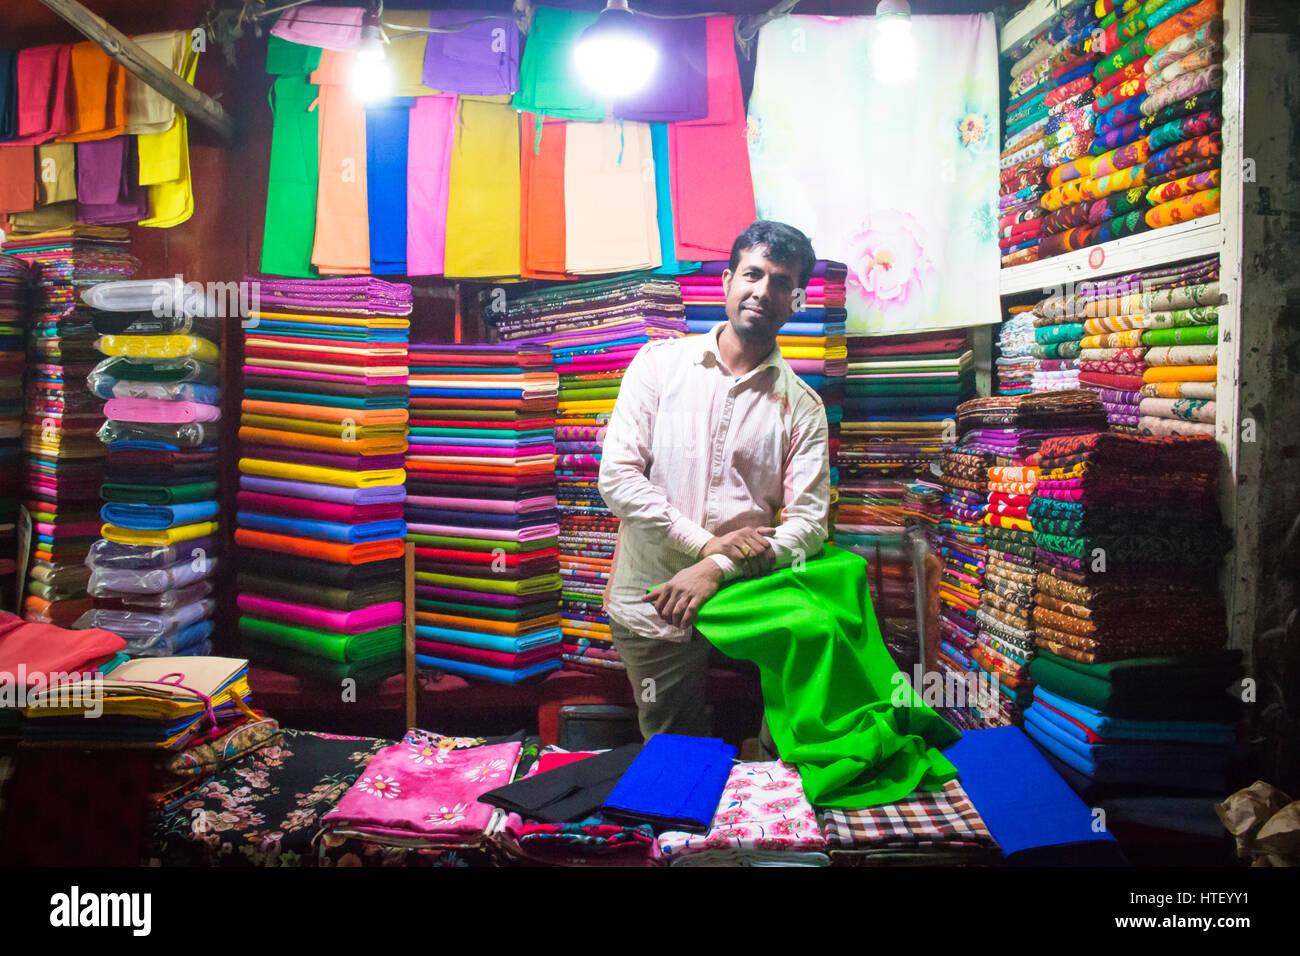 Man Woman Clothes Colorful Stock Photos & Man Woman Clothes